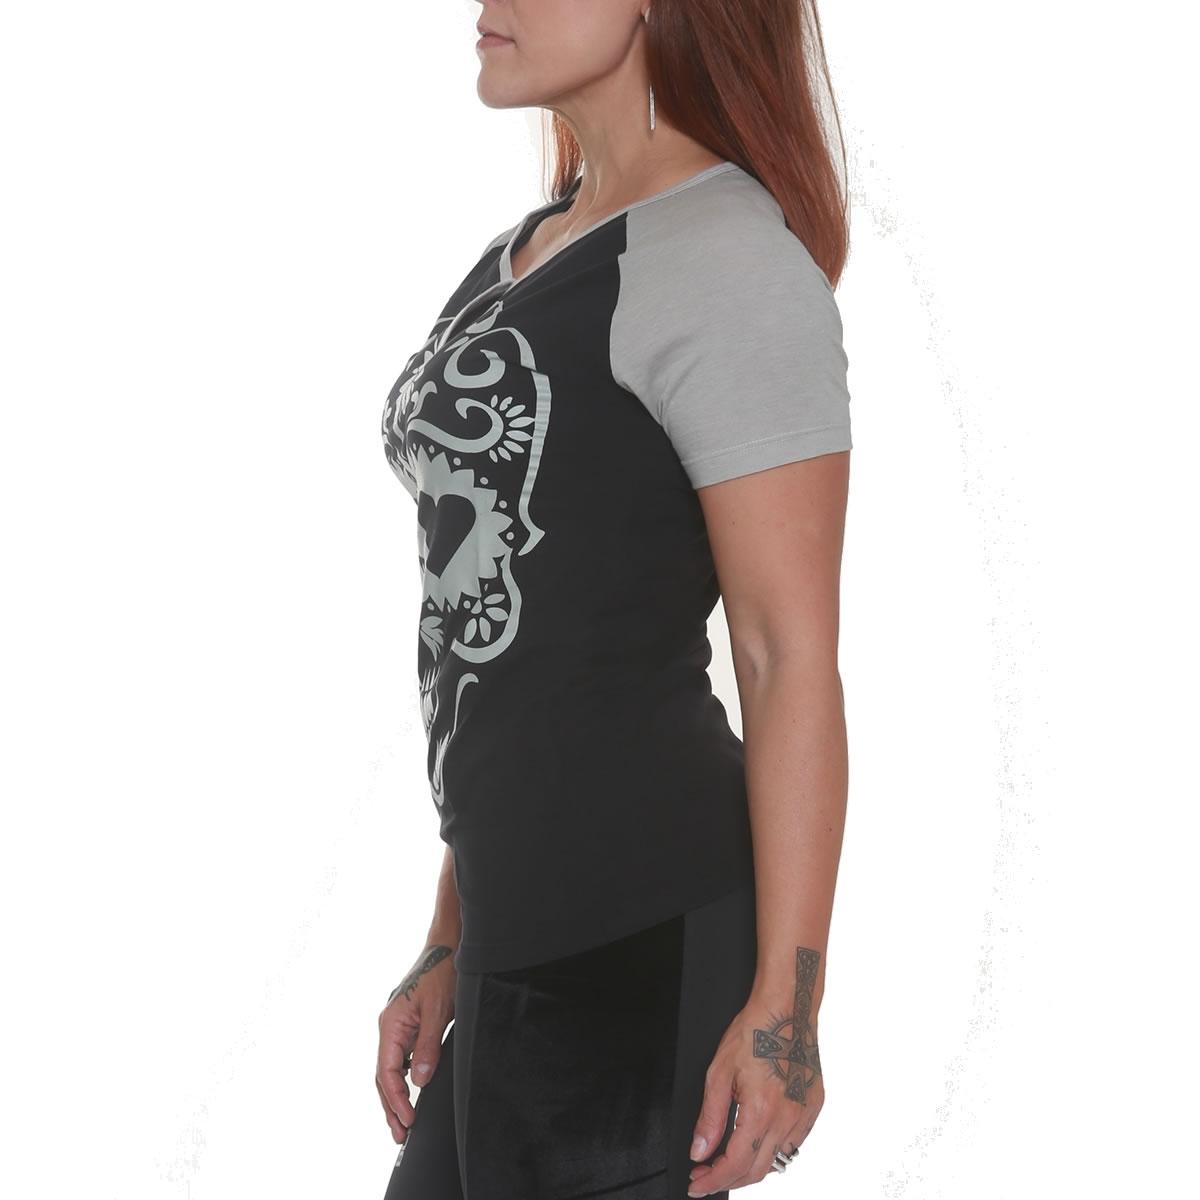 Camiseta Mexican Skull Heart Cinza/Preta - Black Skull Clothing